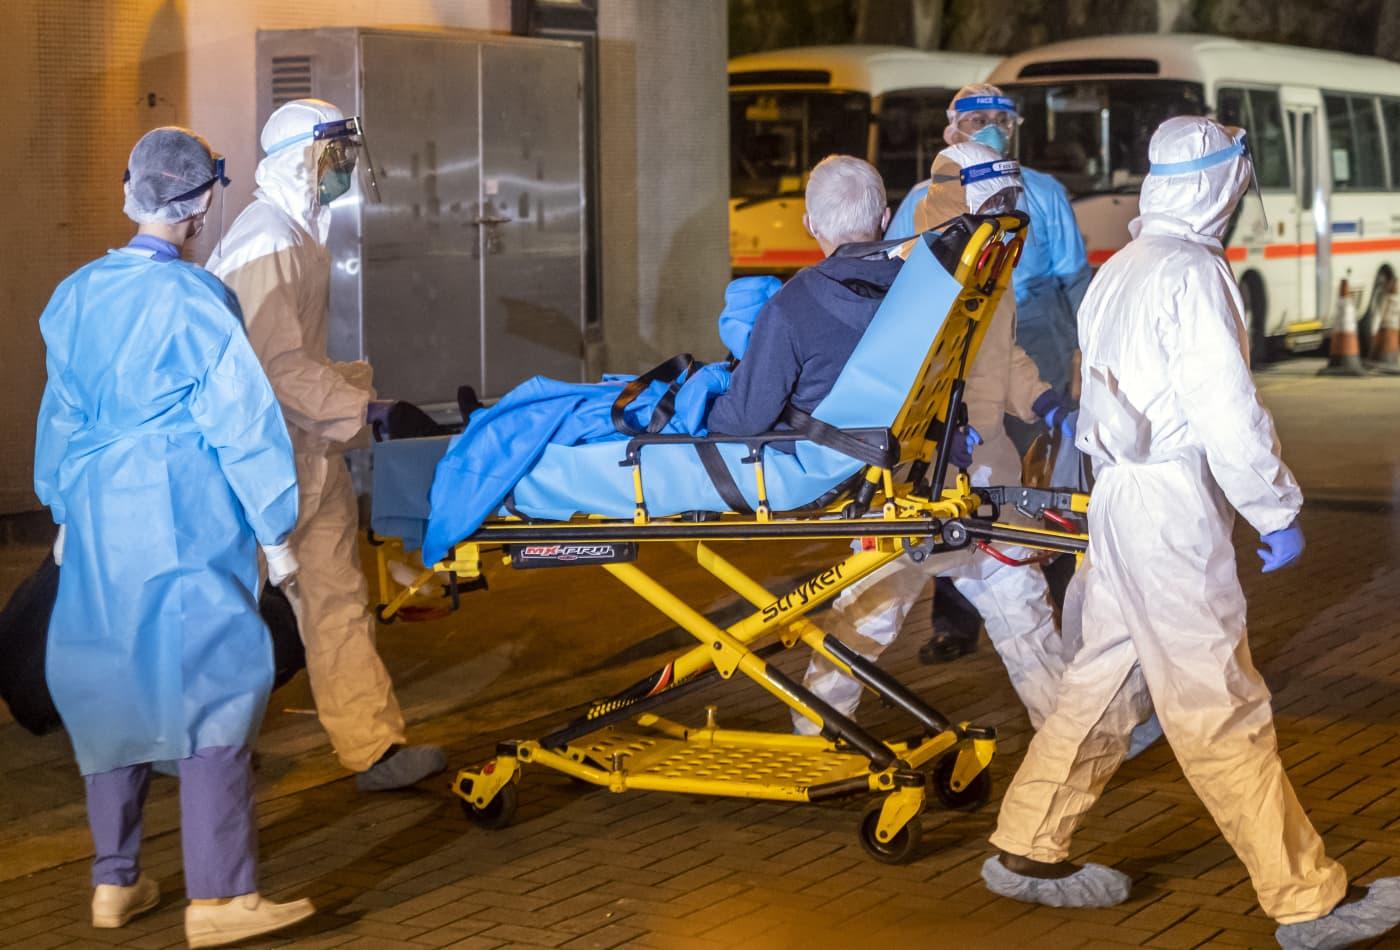 WHO declares China coronavirus that's killed 171 a global health emergency